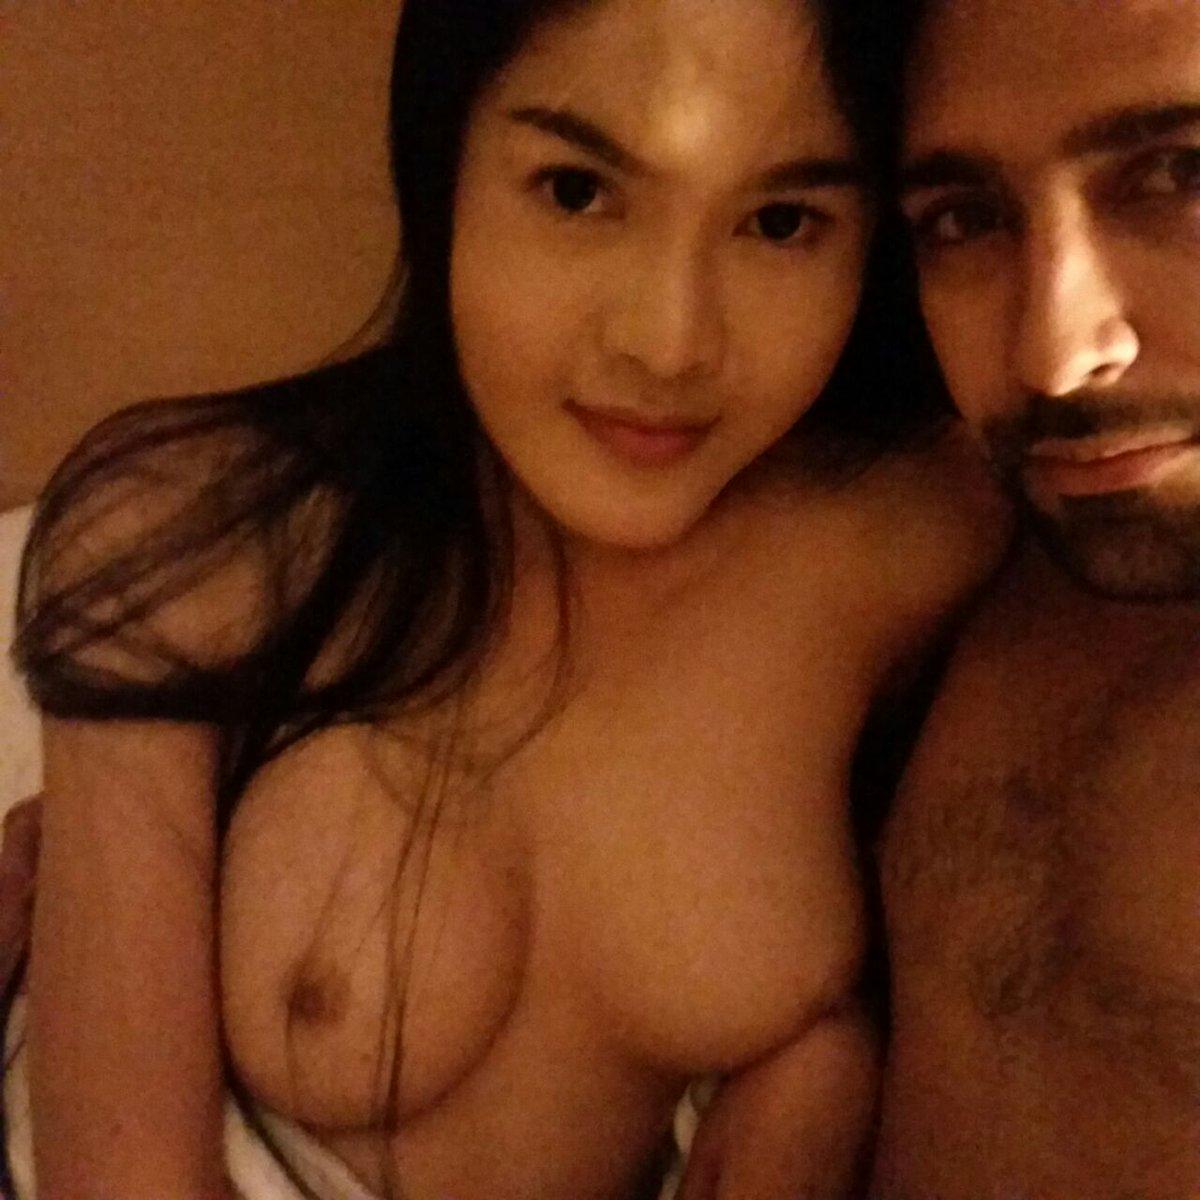 Nude Selfie 8604